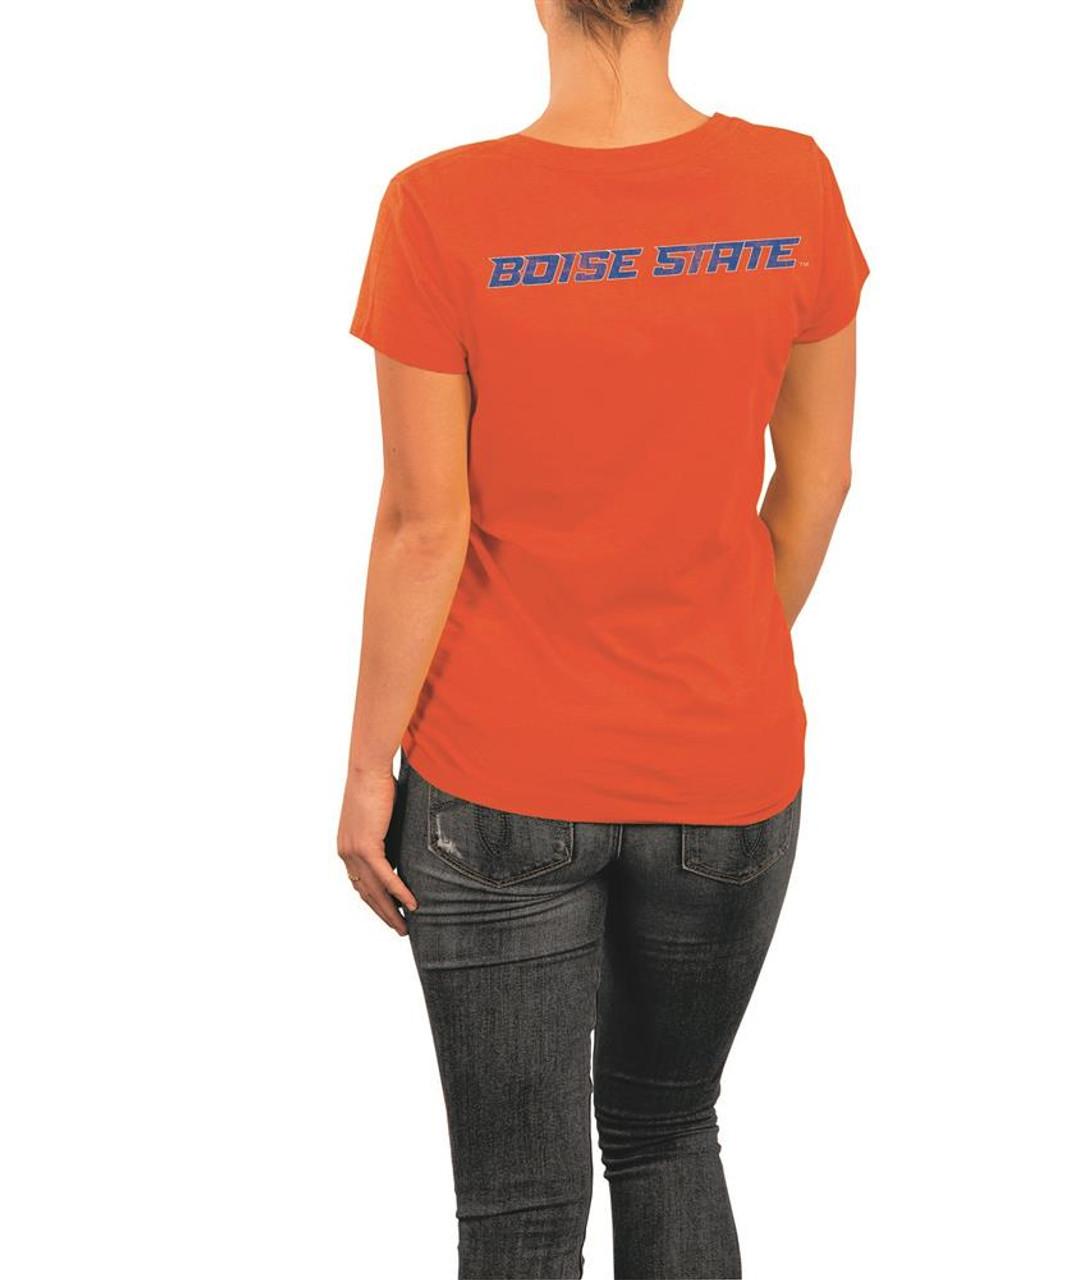 Women's Hurdle Short Sleeve Kansas State University Graphic Tee